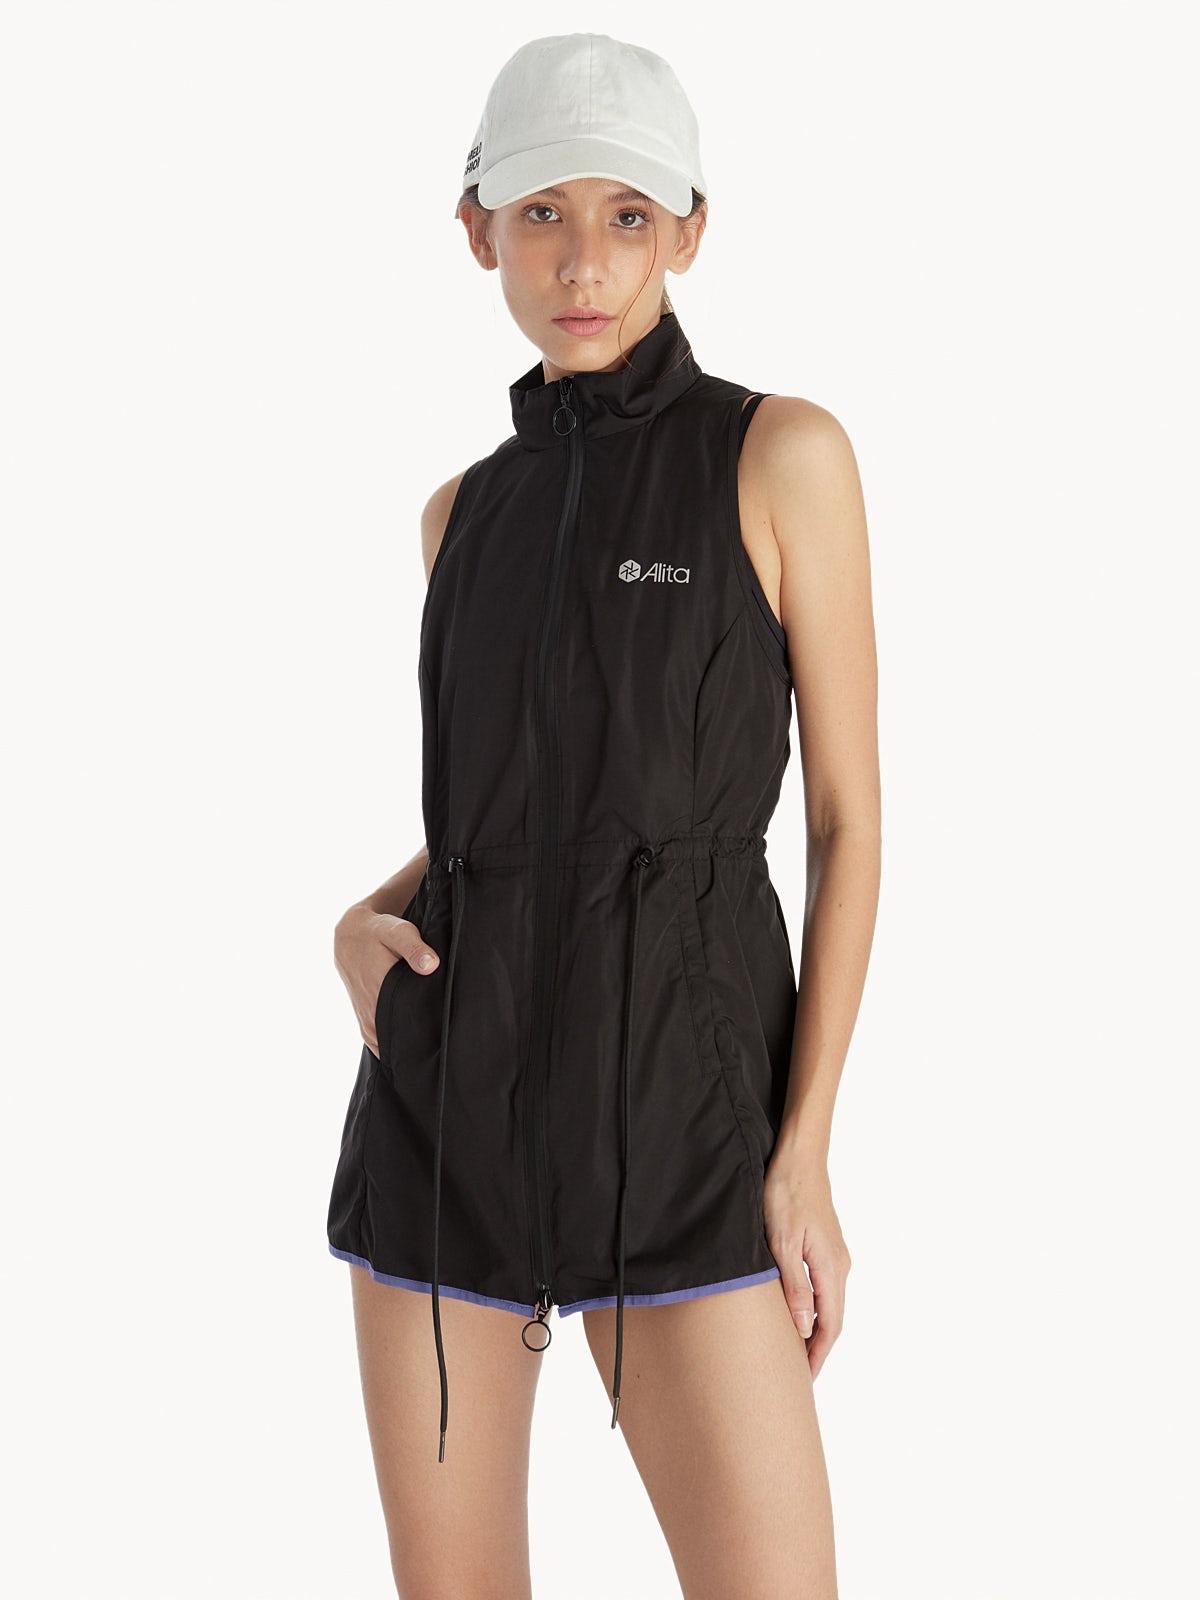 Sports Outerwear - Alita by Pomelo Fashion - Pomelo Singapore ac7e8091a